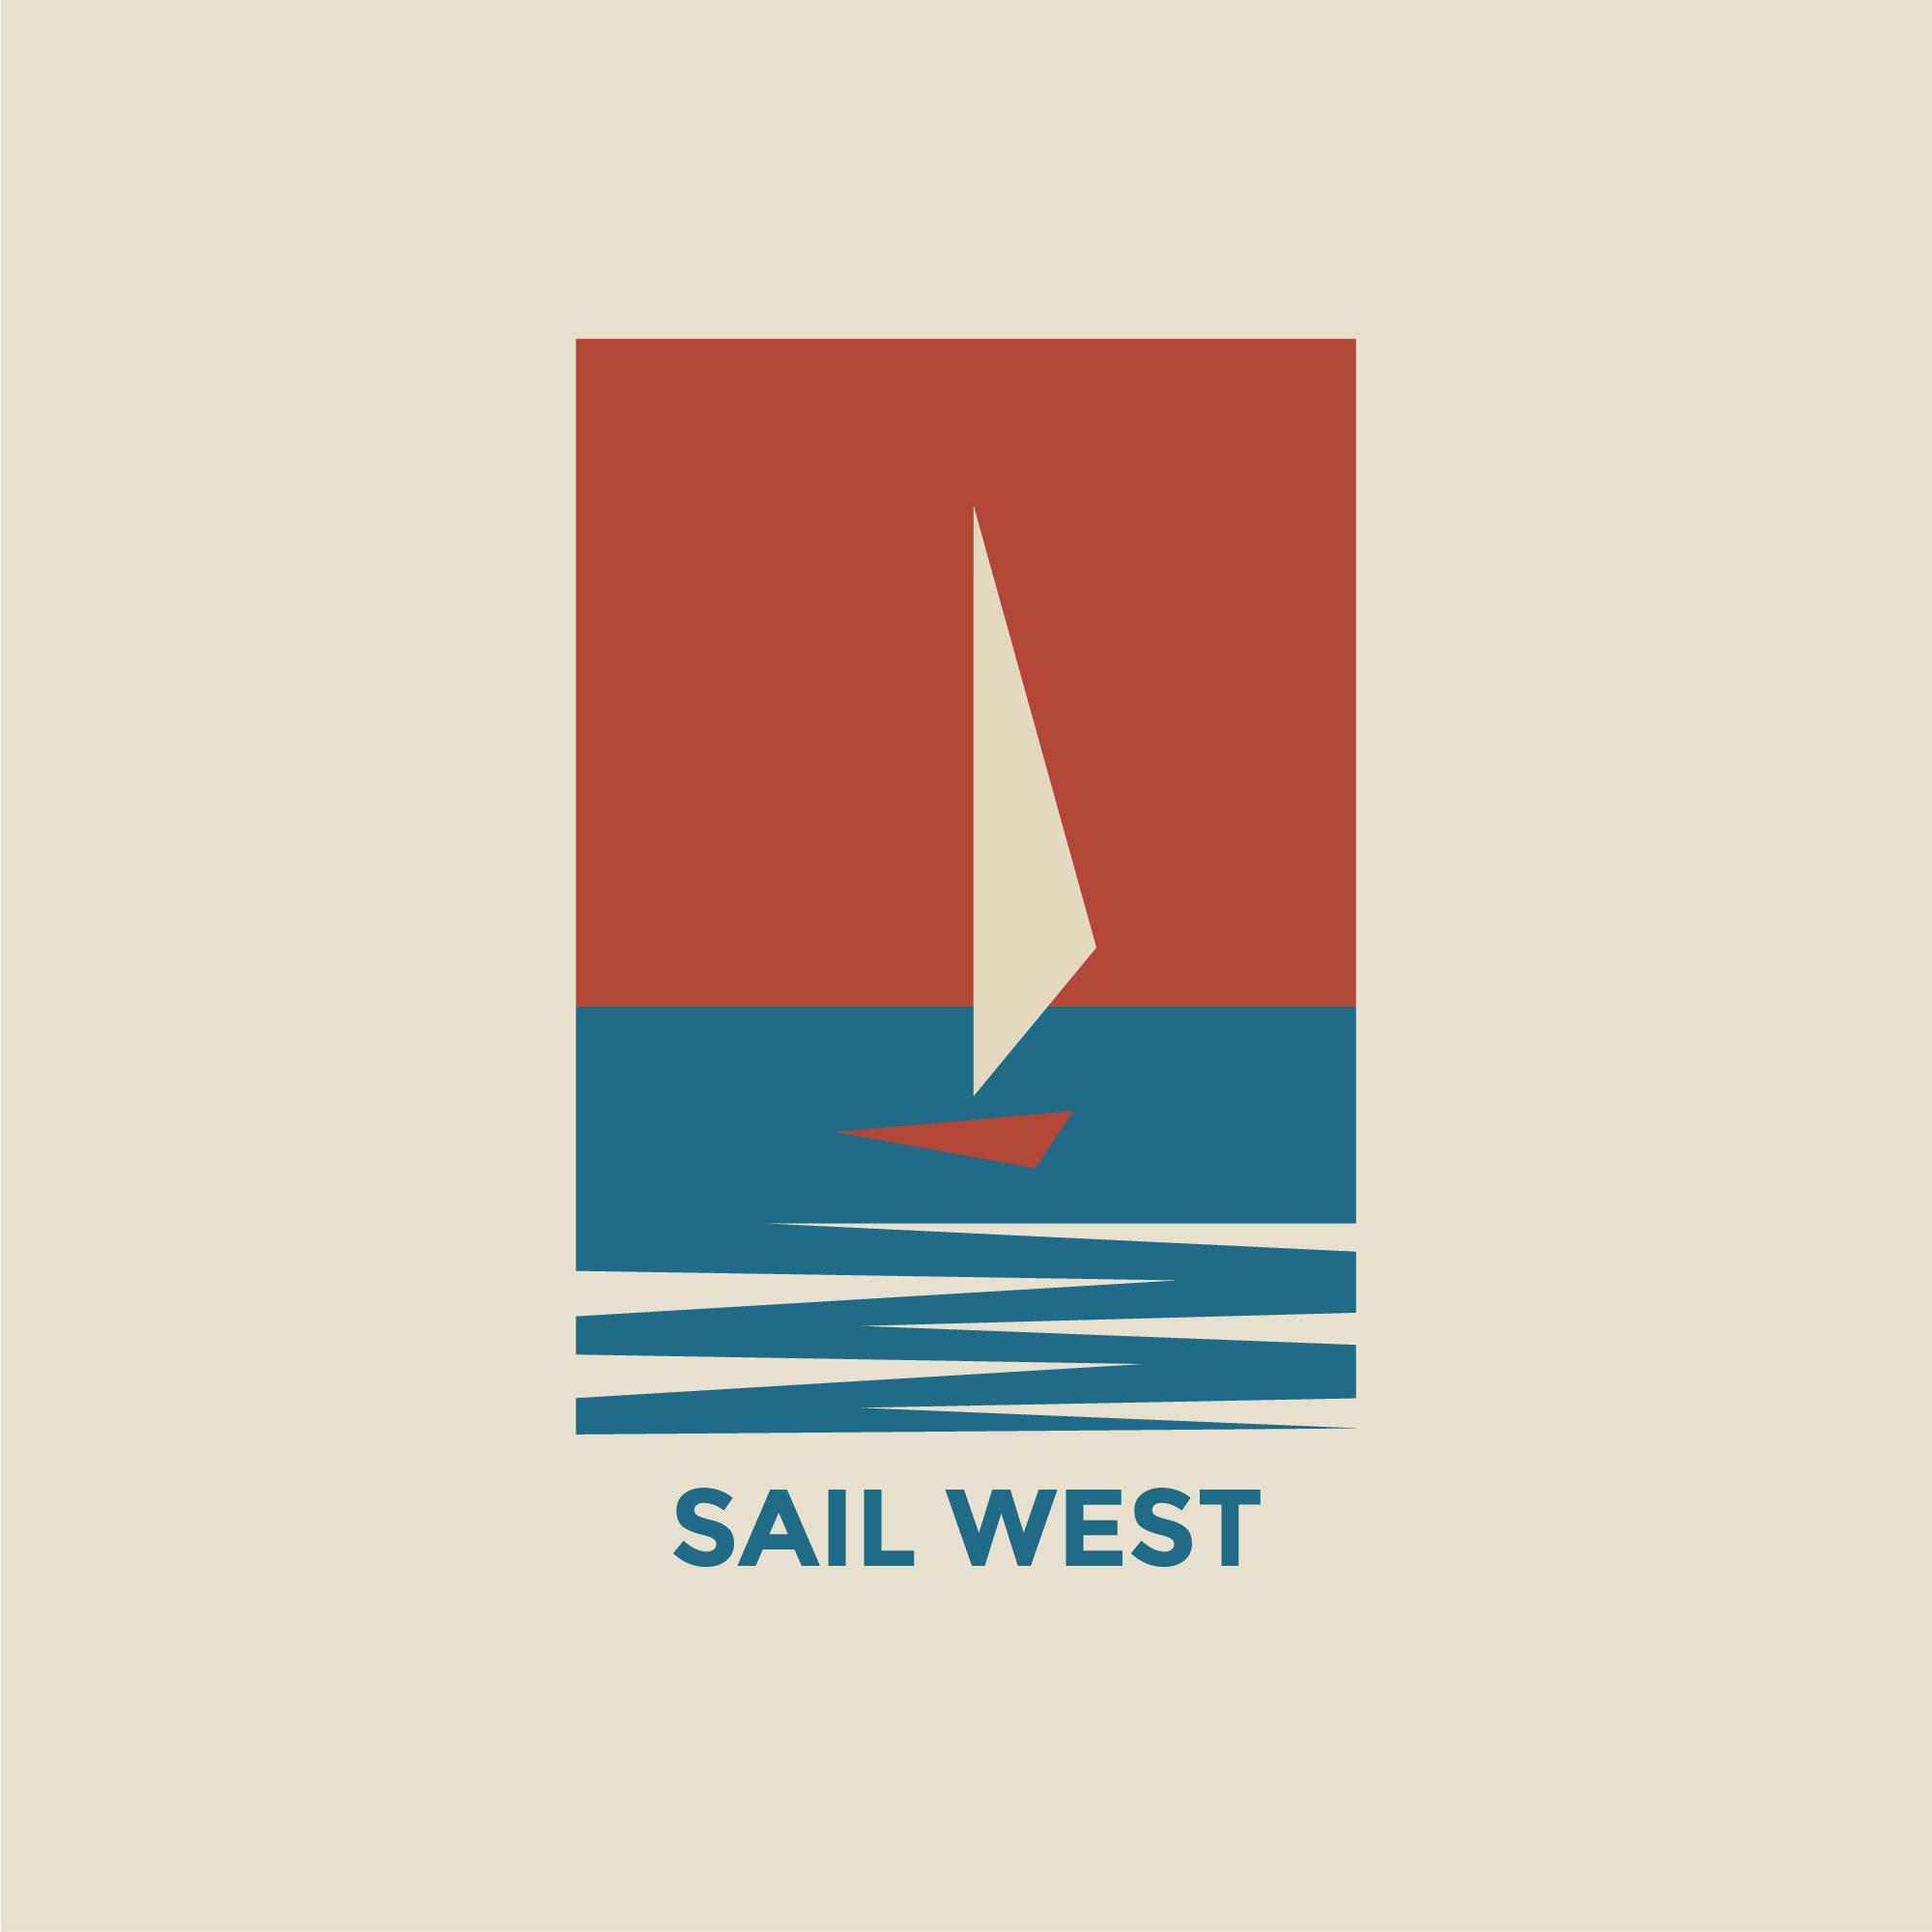 Sailwest_ArtemDesigns-01.jpg